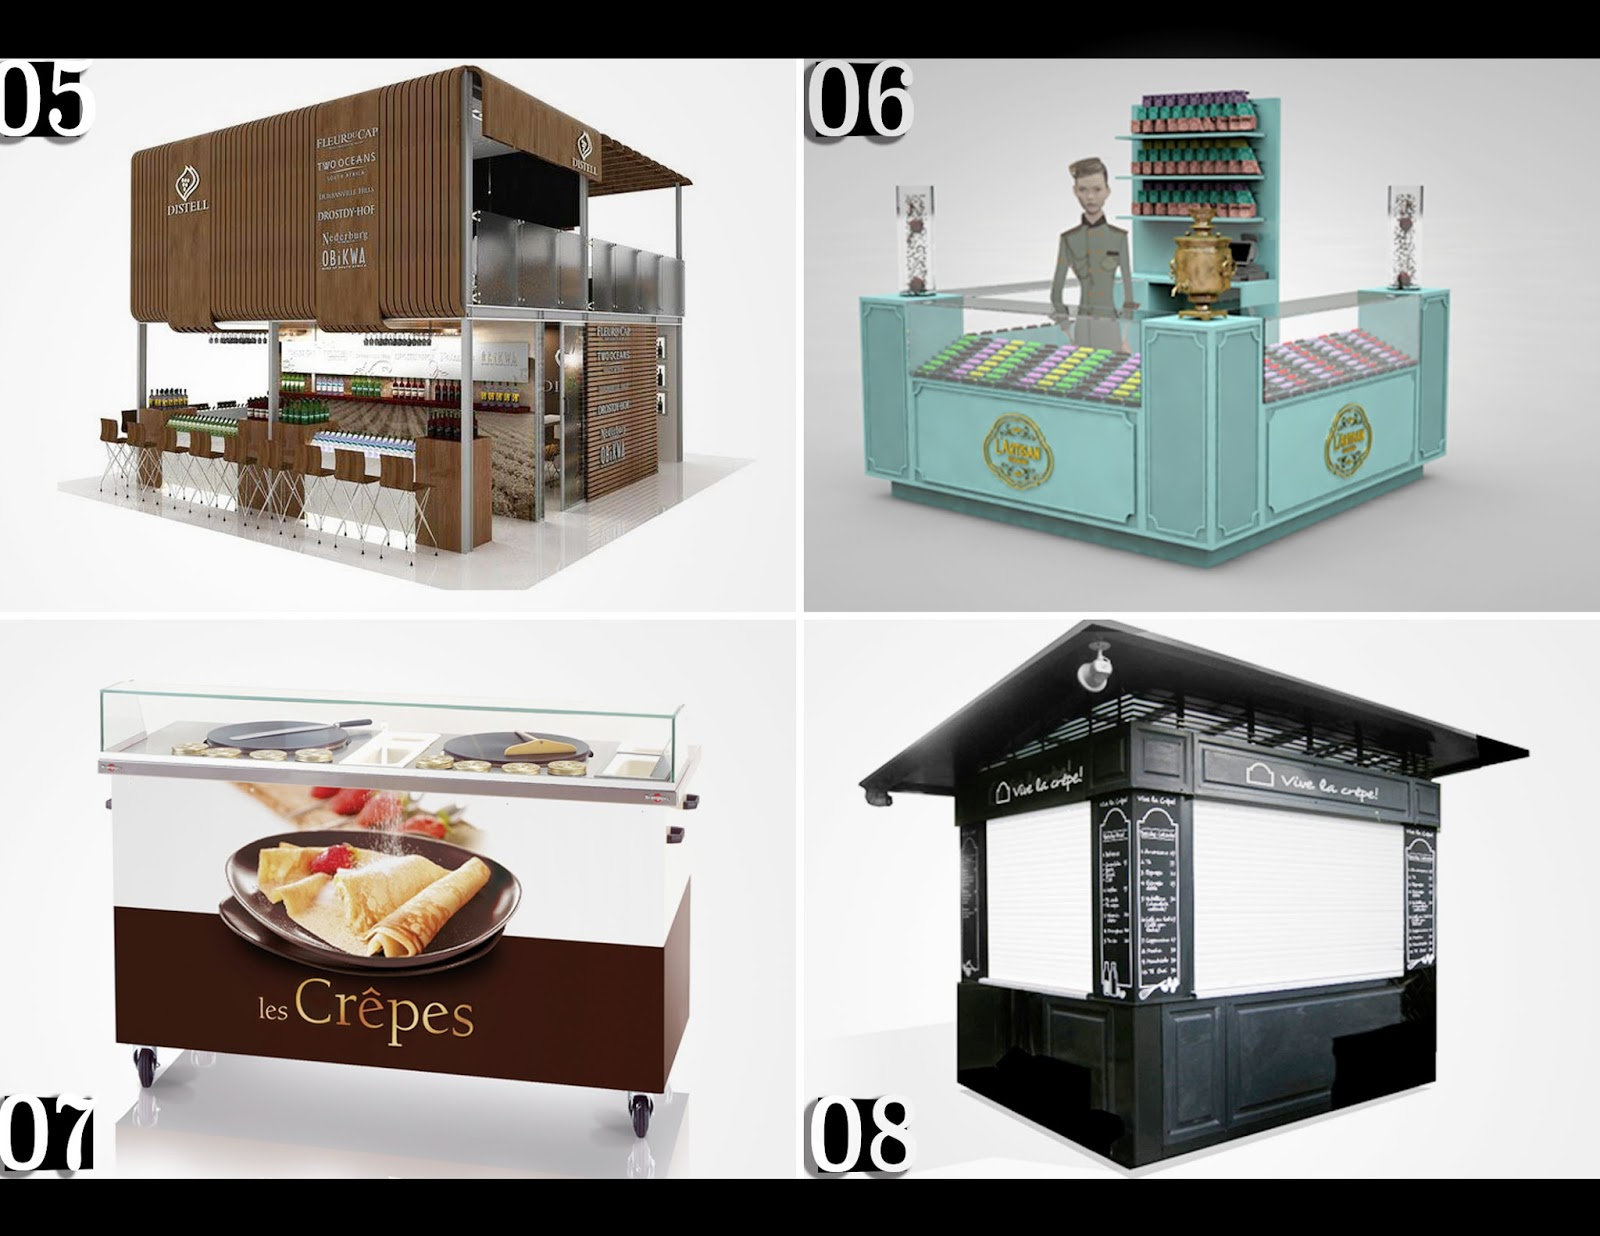 Jewelry kiosk manufacturers thin blog for Garden kiosk designs